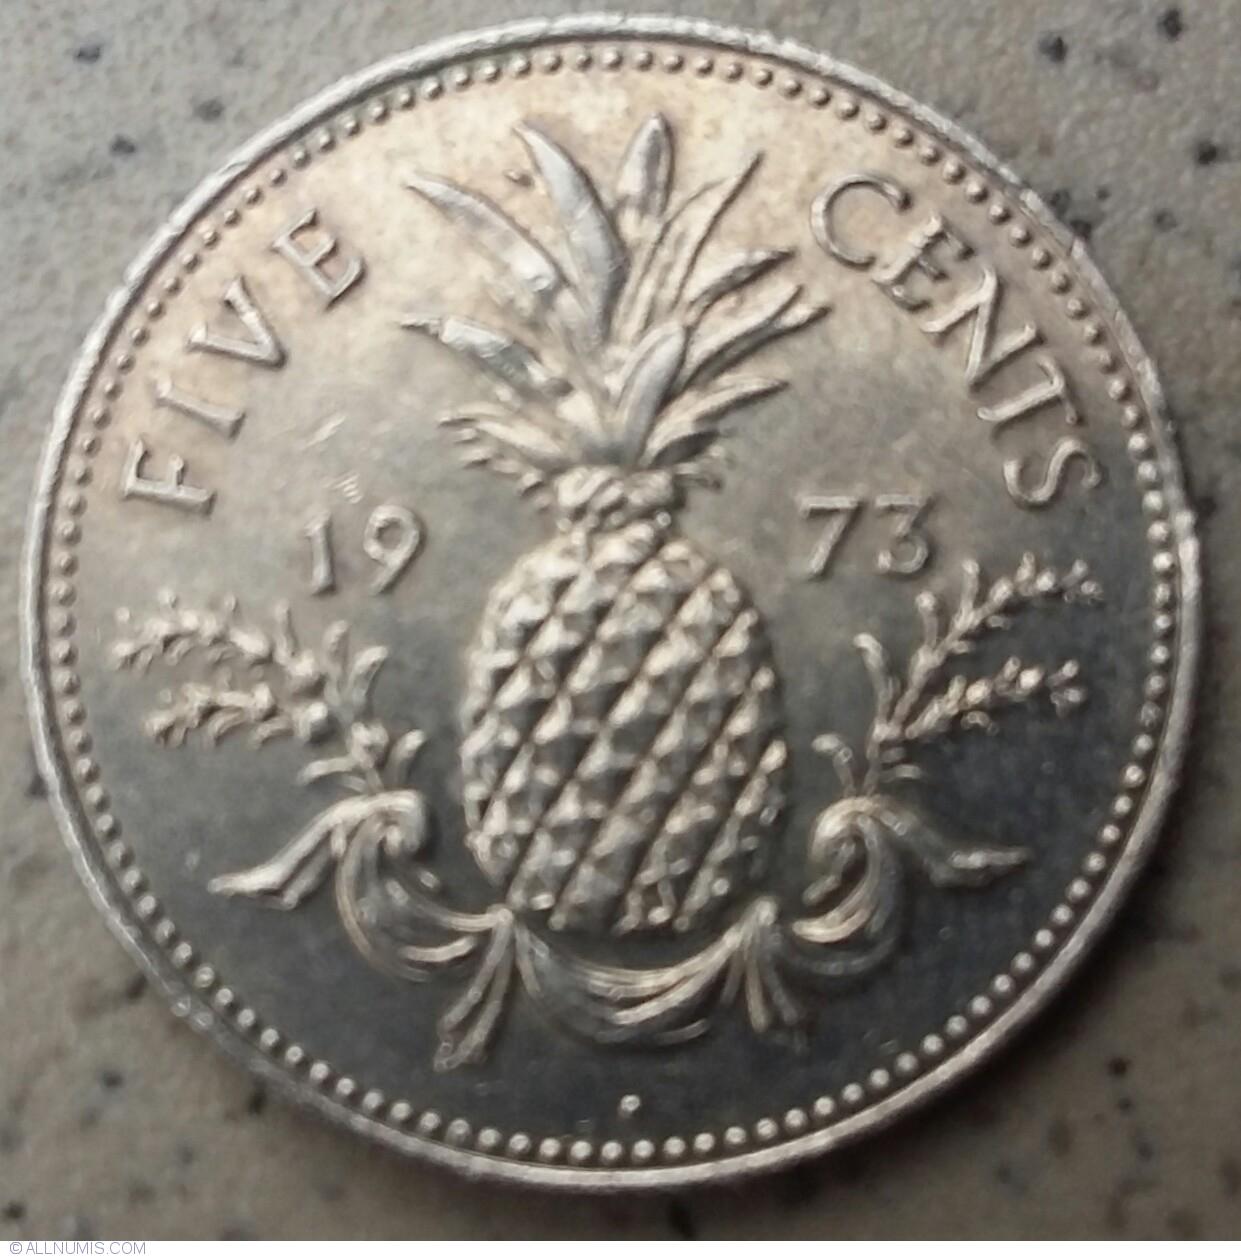 Bahamas 5 Cents 1973 Proof #p29 483alb29 Coins: World